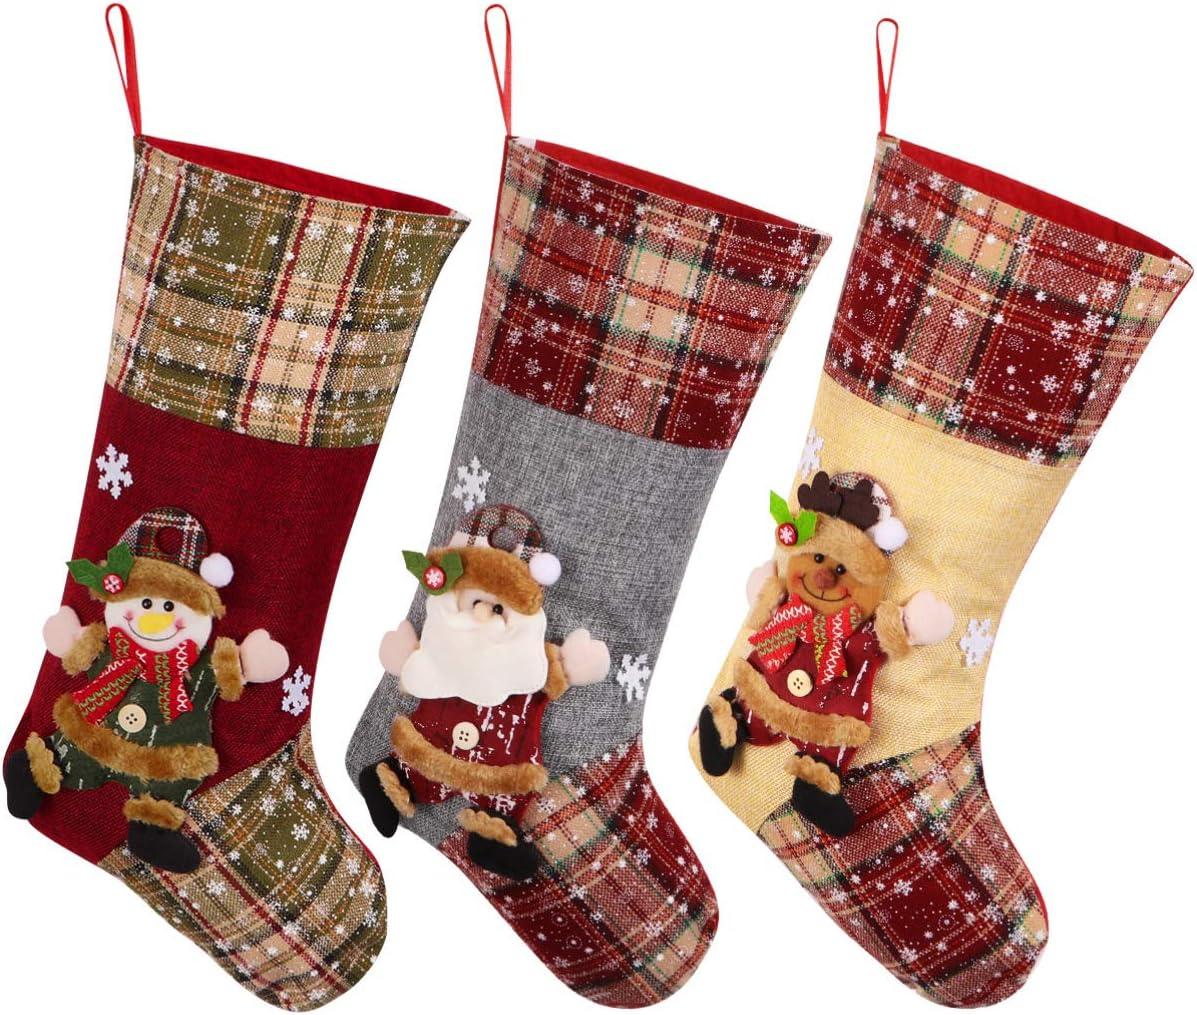 Toyvian Christmas Ranking TOP13 Stocking Gift Bag 3D Santa Plush lowest price Snowman Sock